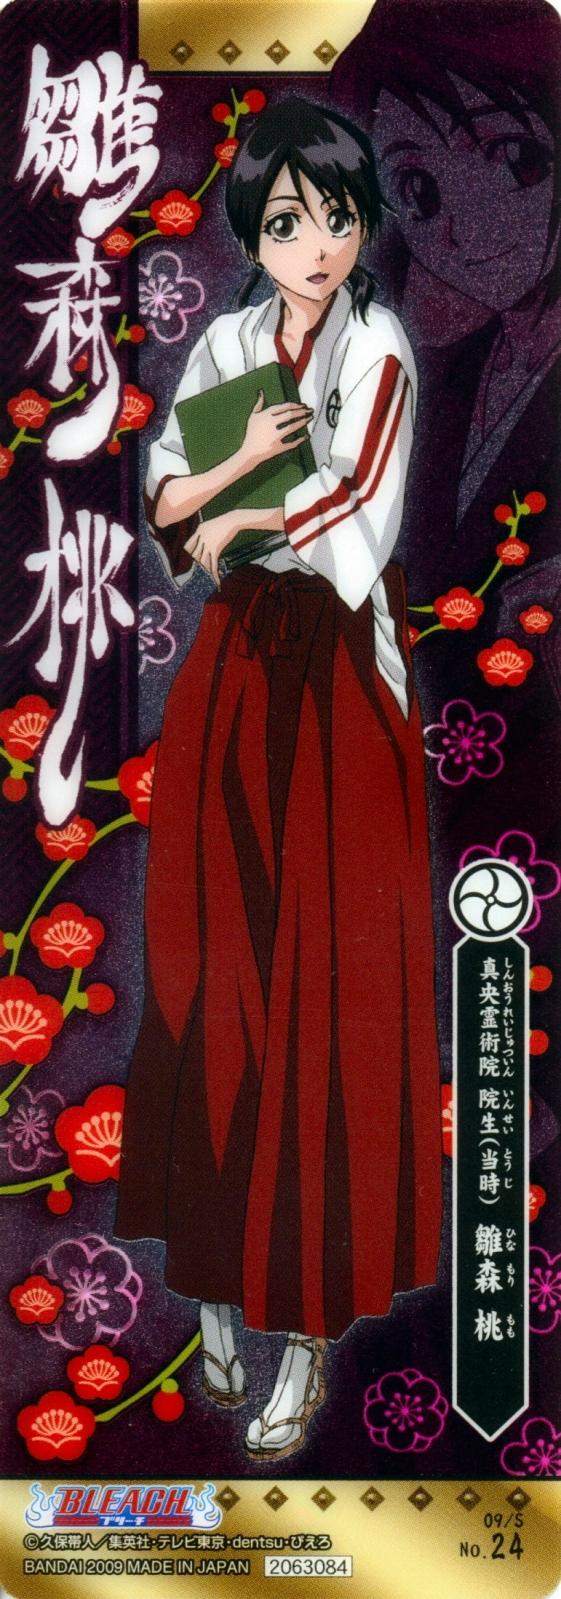 Tags: Anime, BLEACH, Hinamori Momo, Shinigami Academy Uniform, Scan, Official Art, Gotei 13